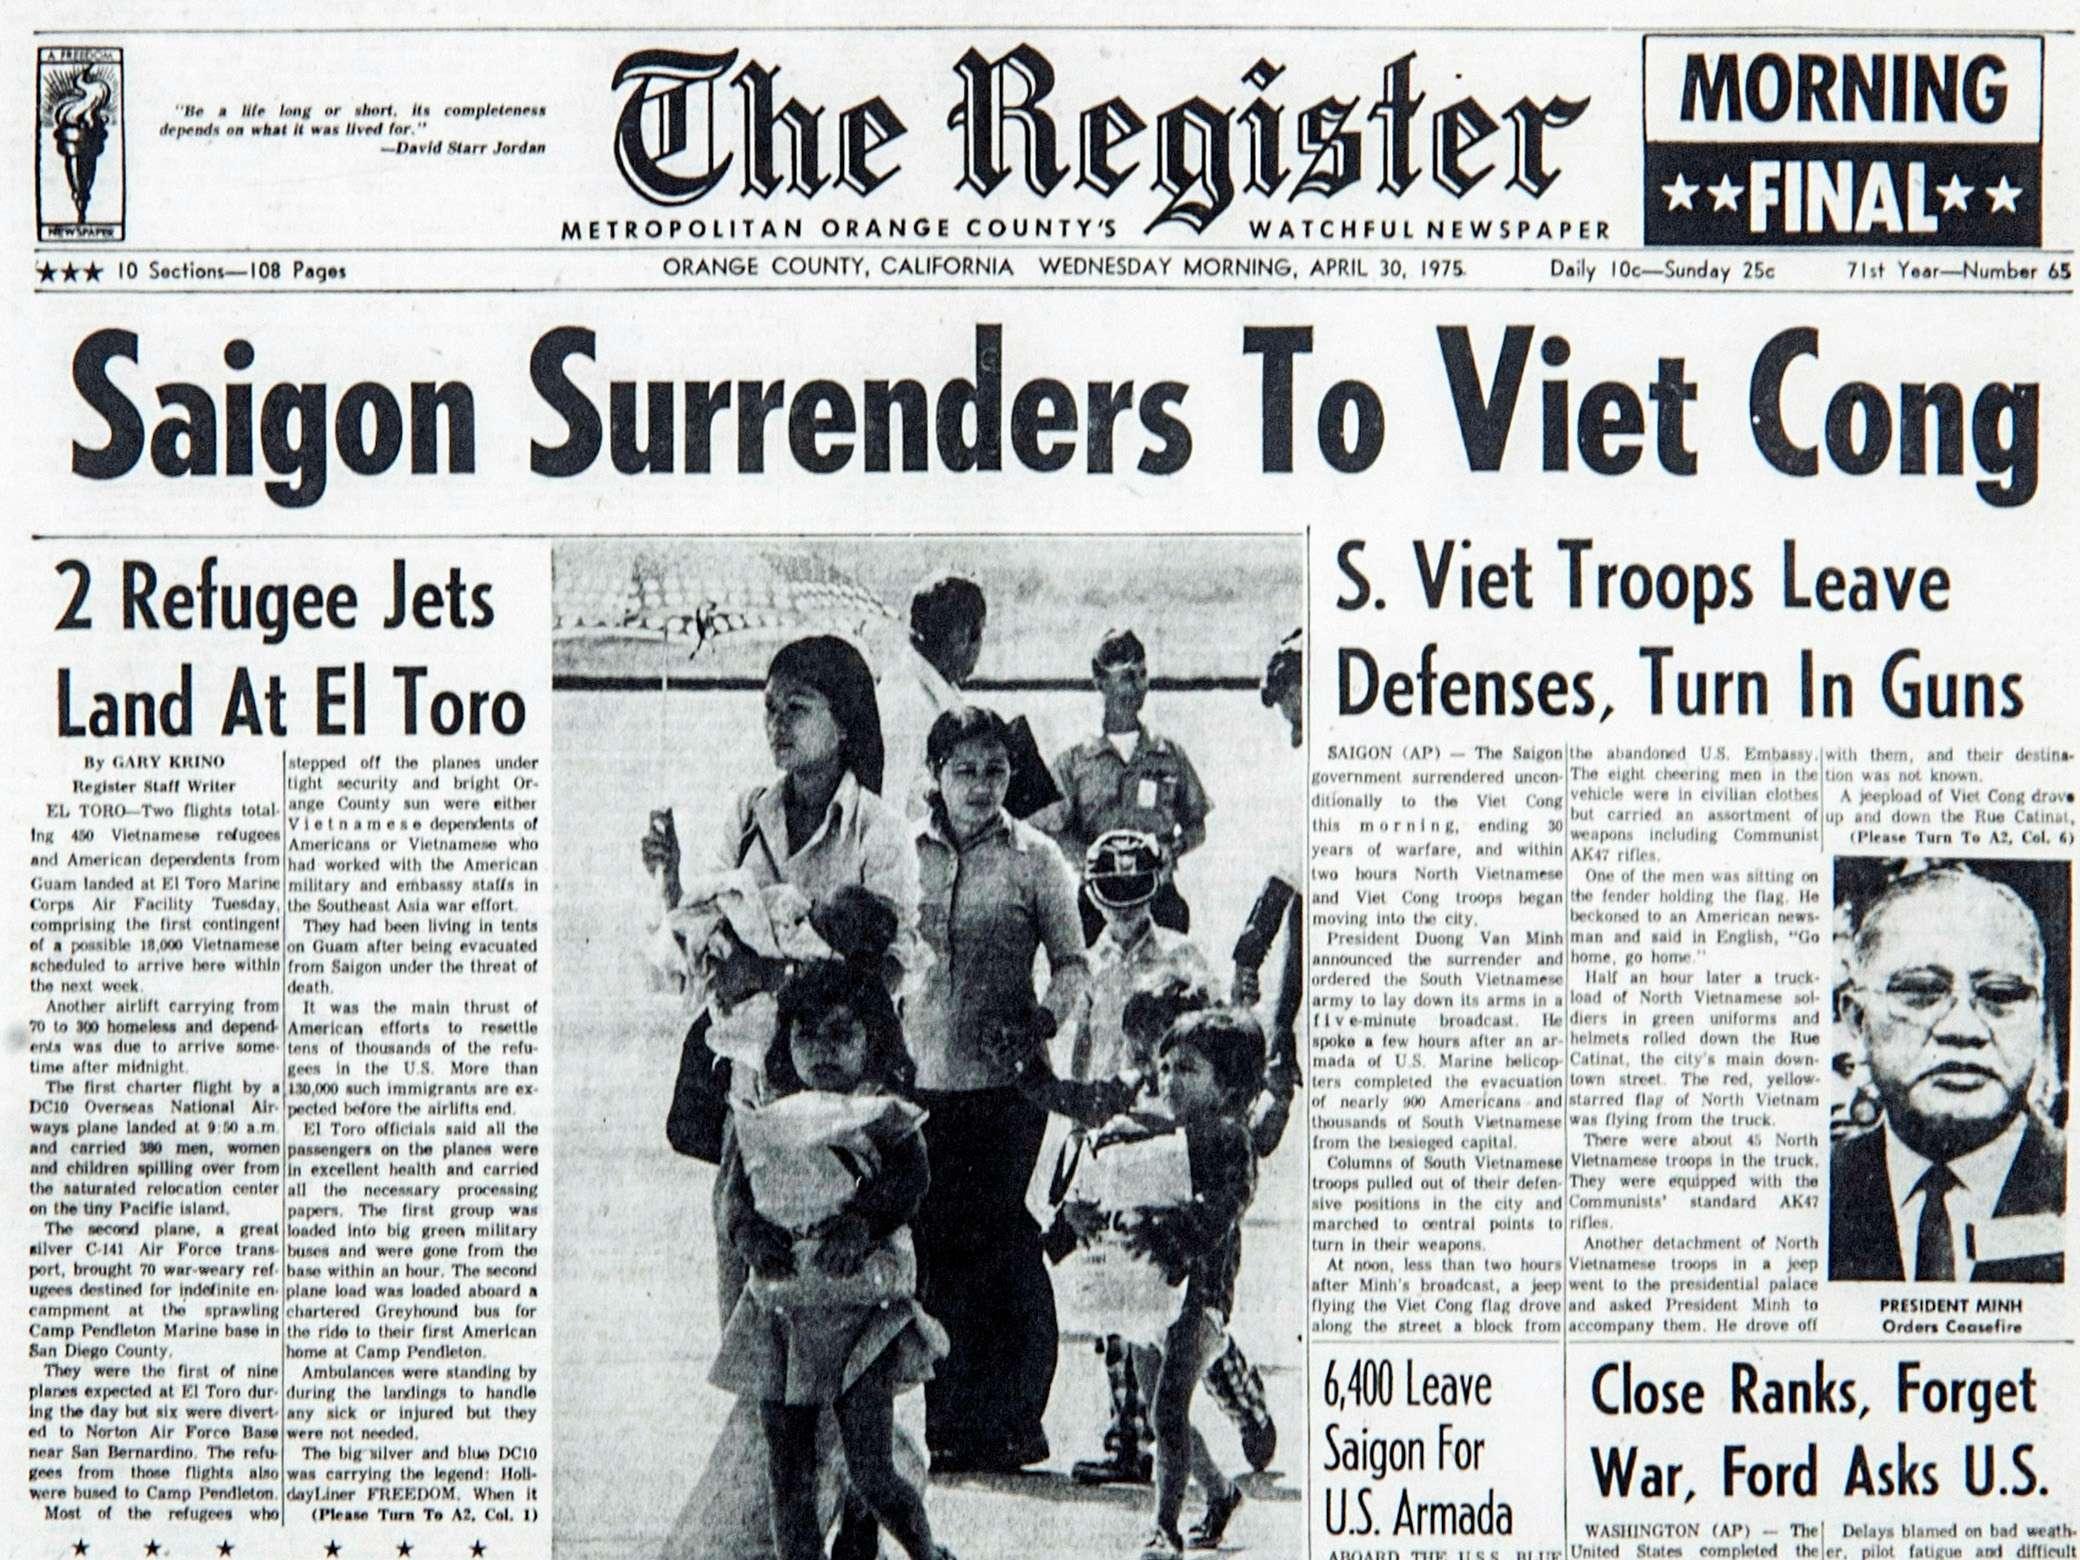 Saigon Surrenders 1